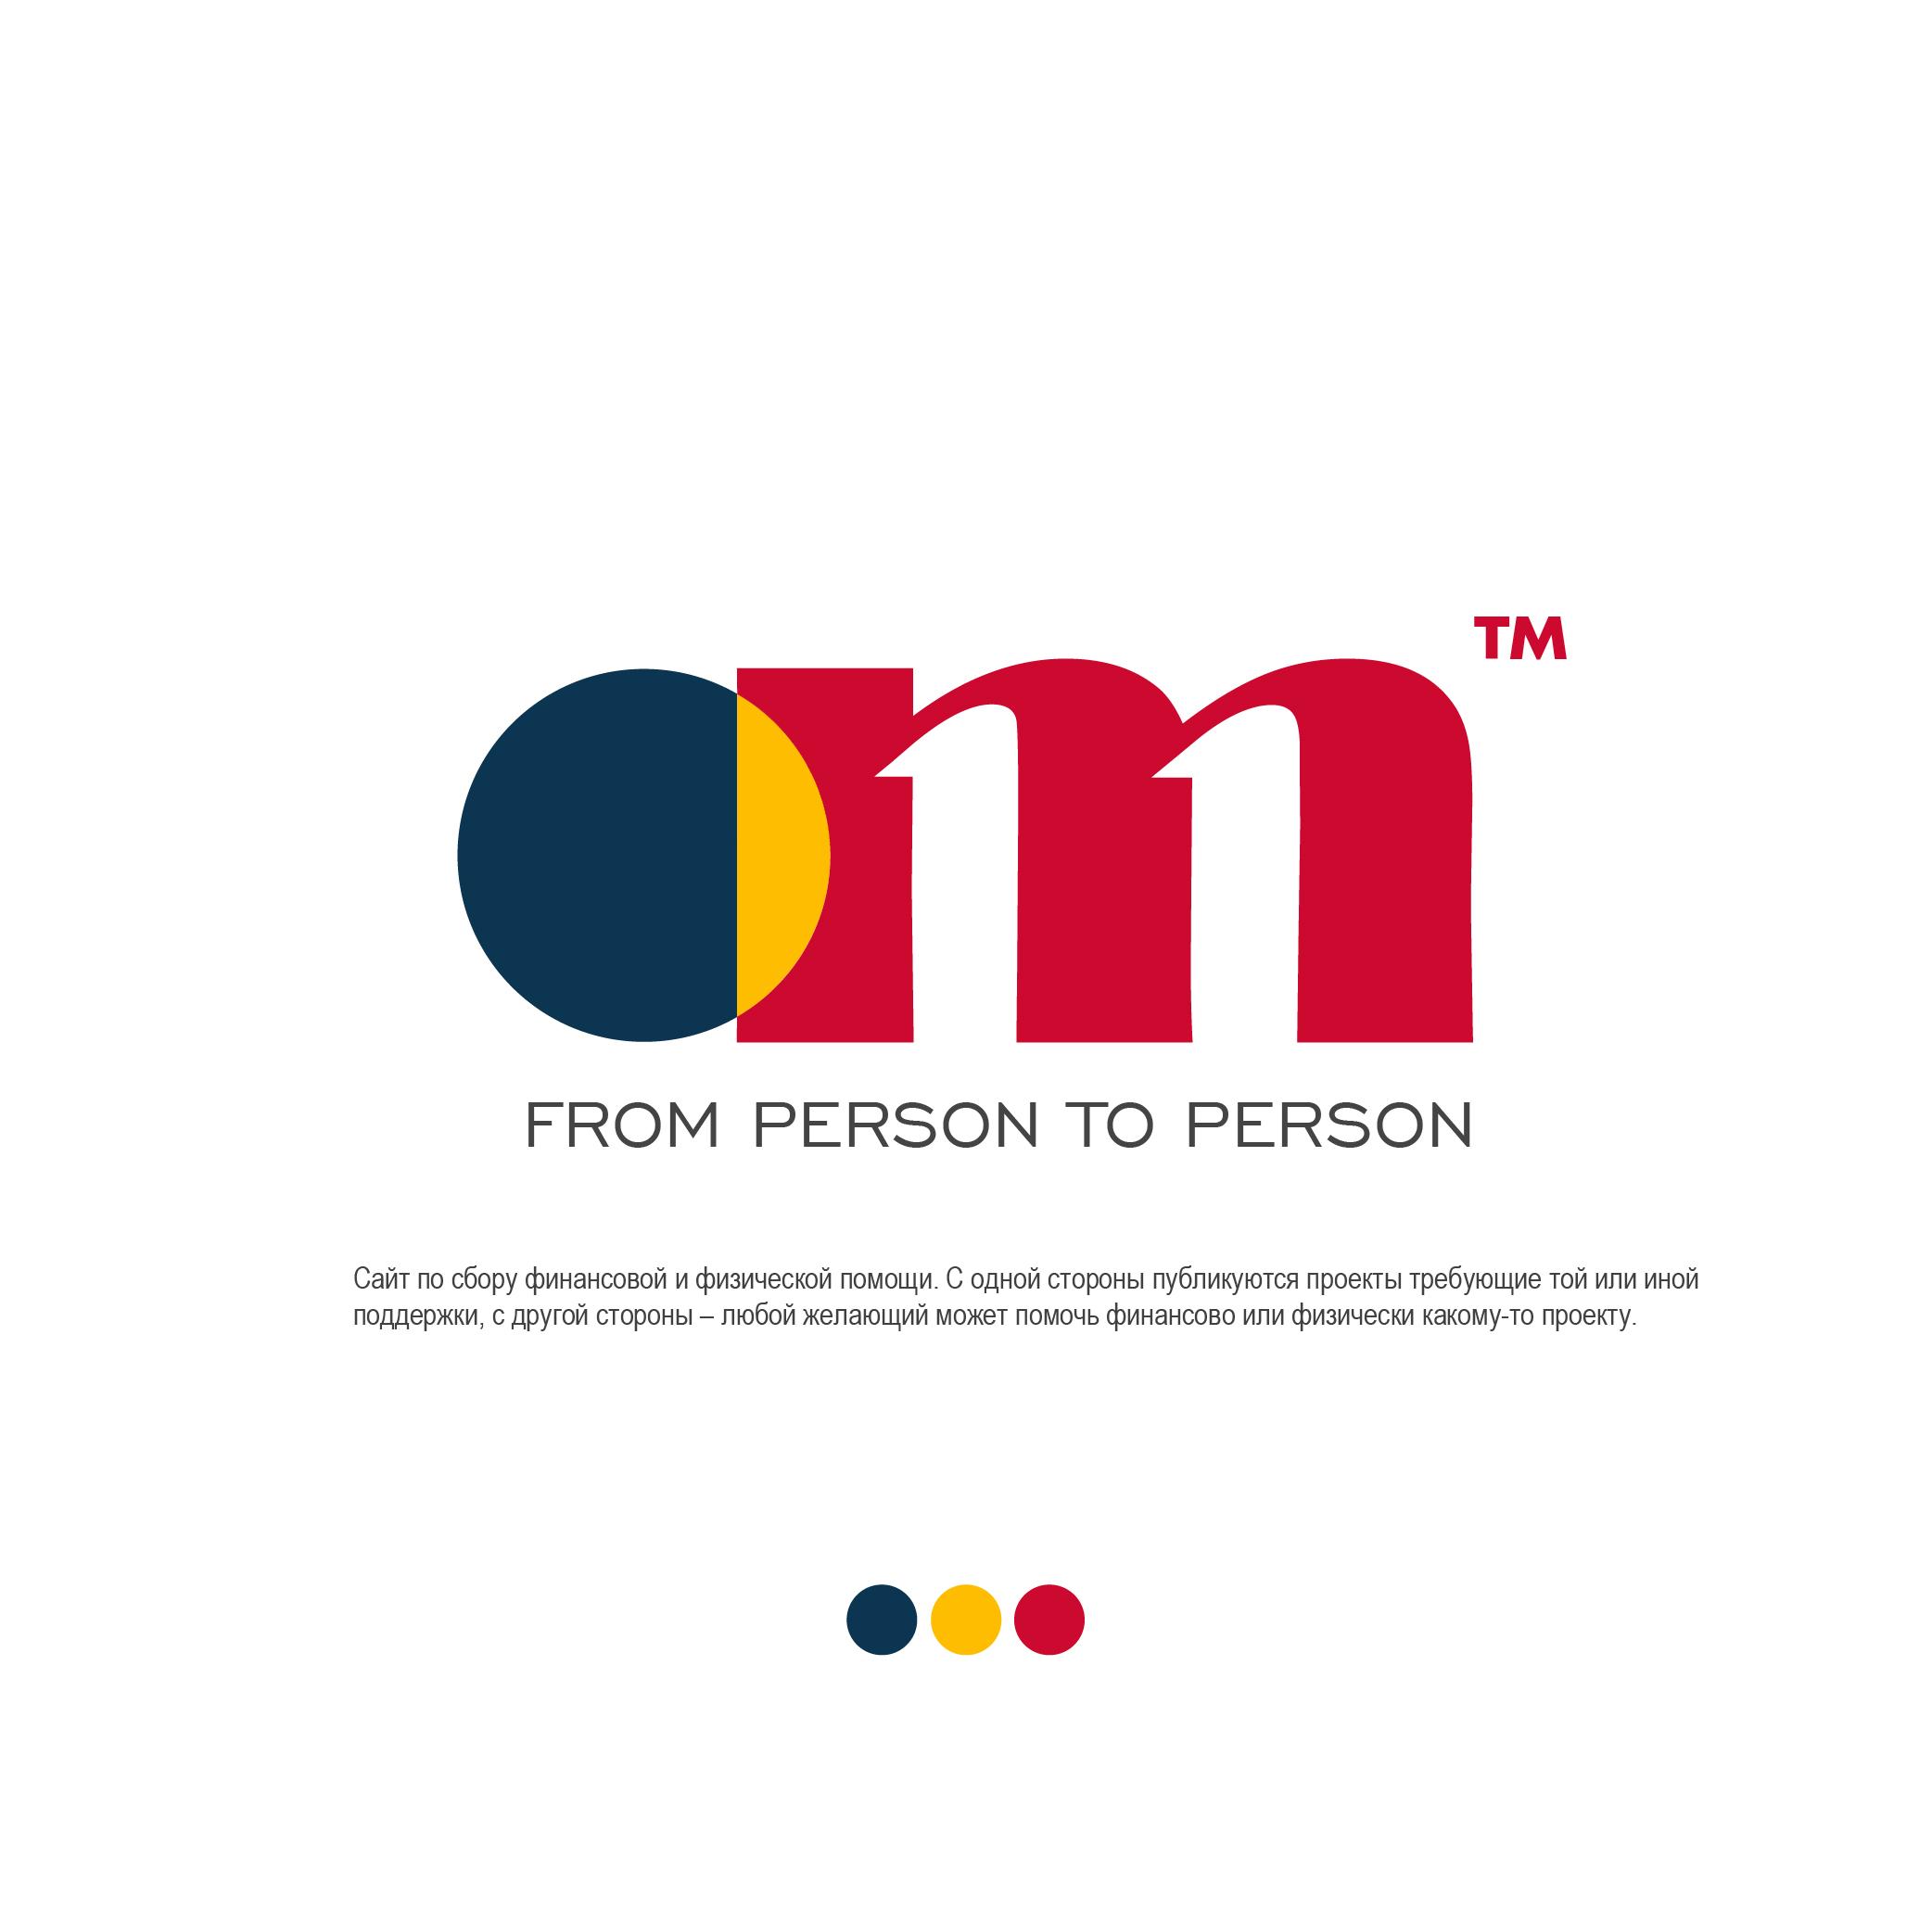 Разработка логотипа для краудфандинговой платформы om2om.md фото f_2405f59379ae1f37.jpg